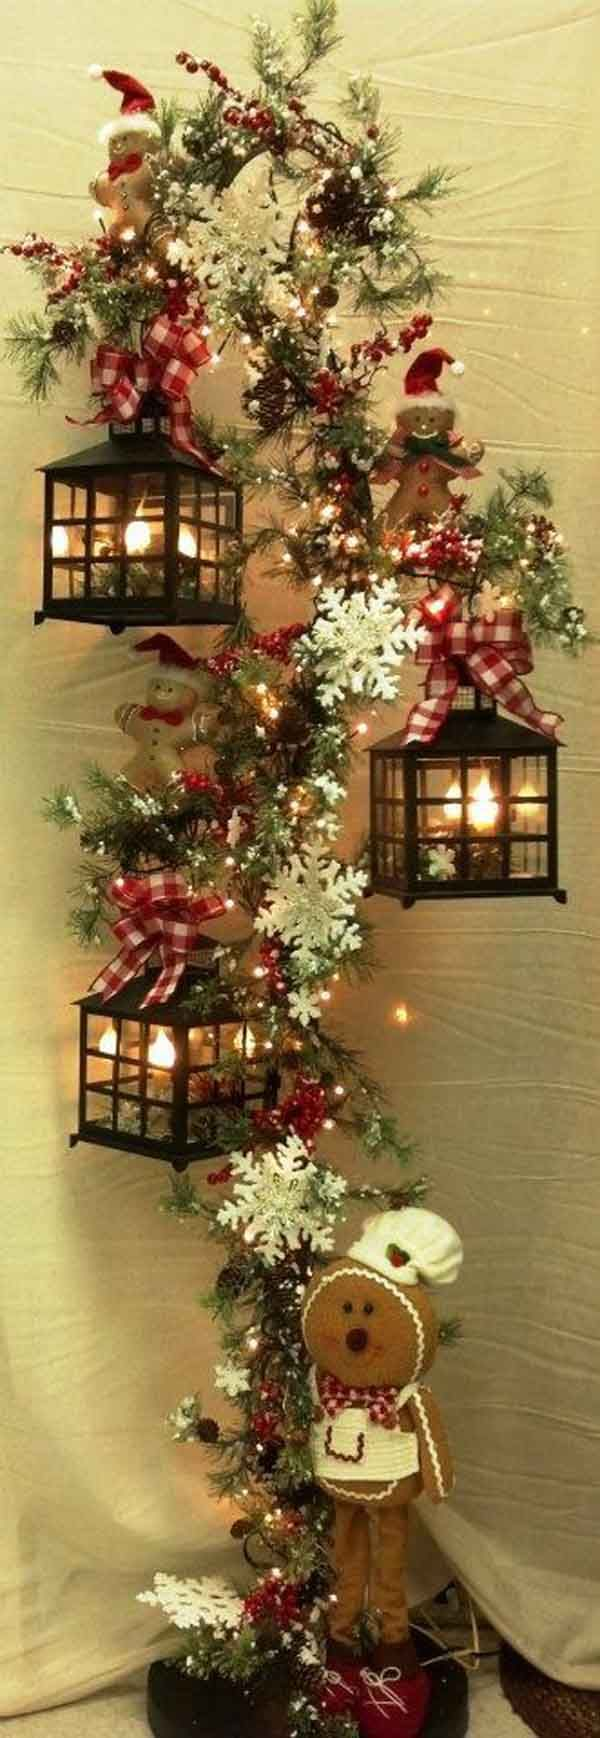 Outdoor christmas decoration ideas pinterest - Christmas Decorations You Must Pin To Your Pinterest Board Easyday